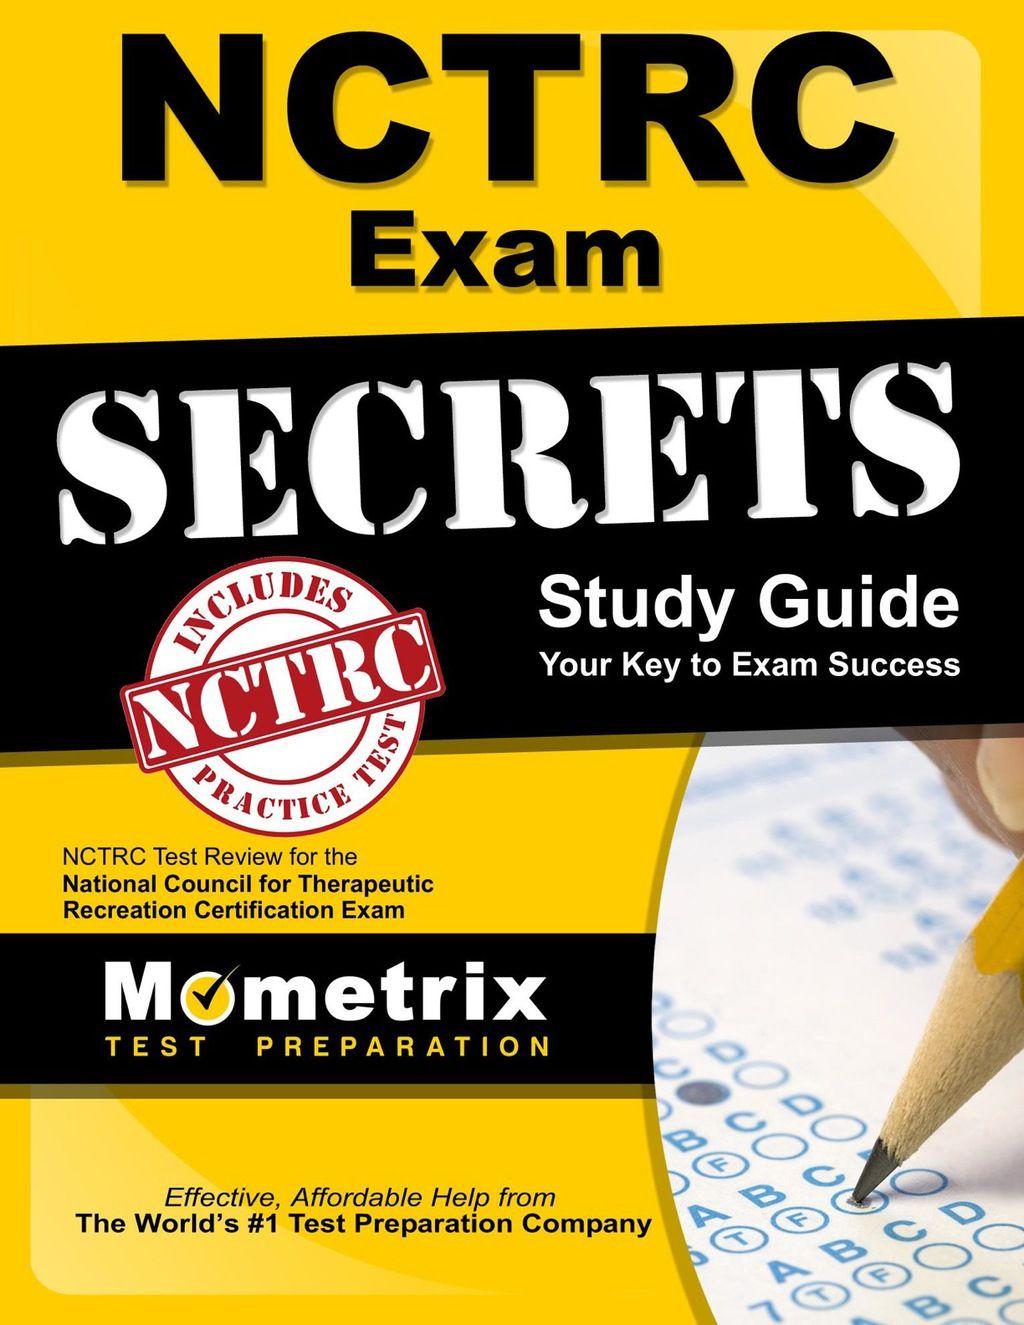 NCTRC Exam Secrets Study Guide (eBook) in 2020 Study